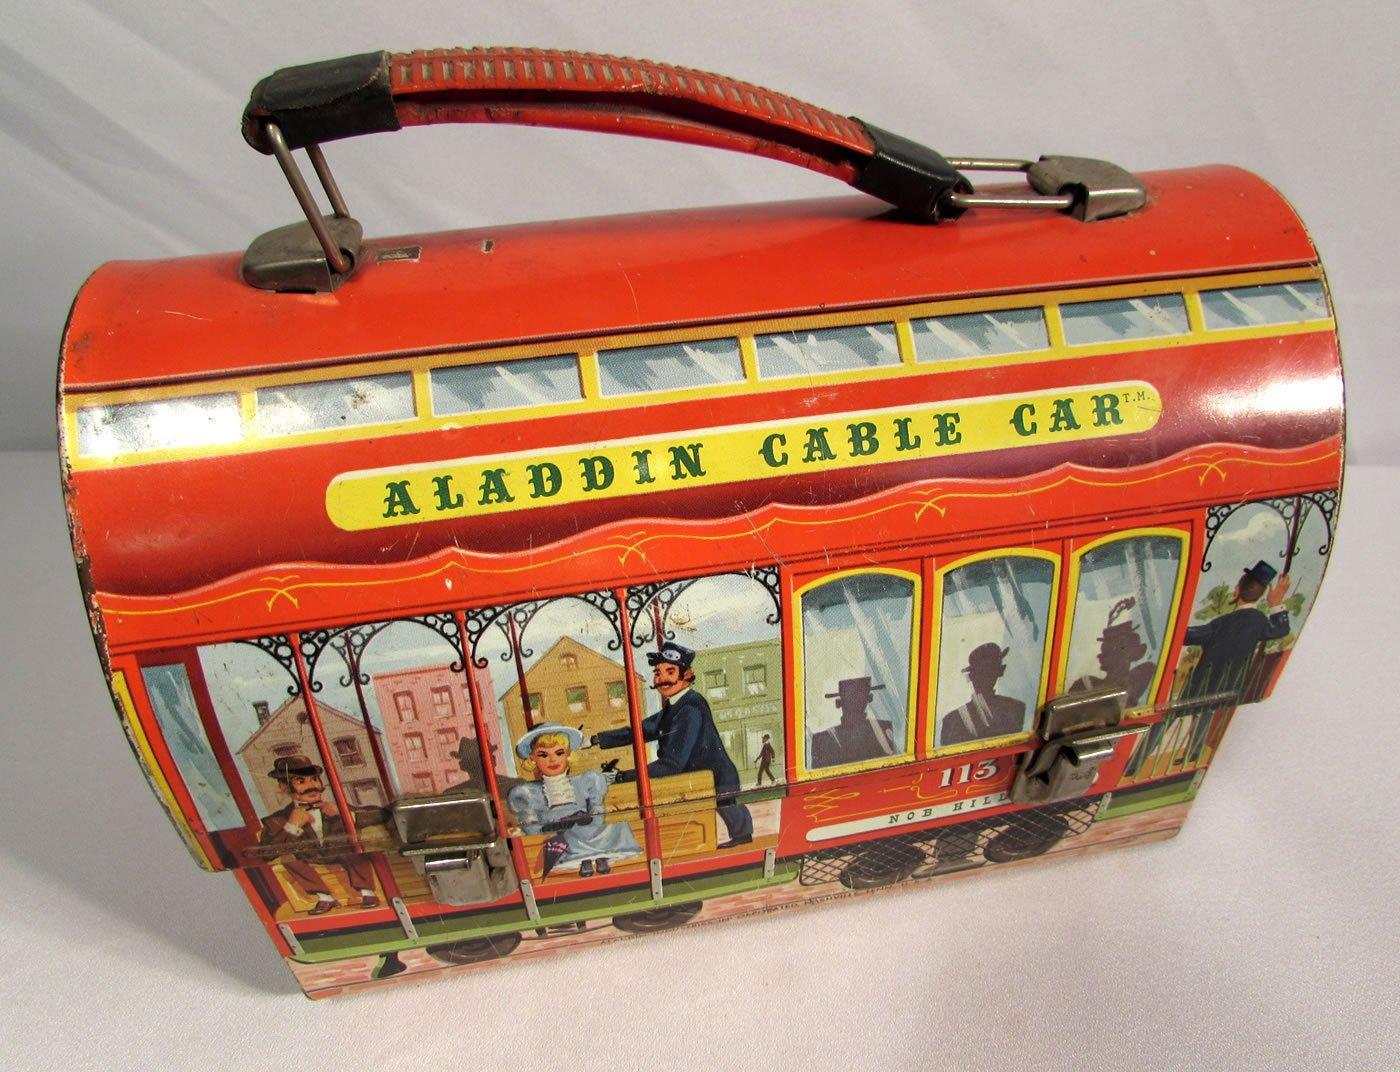 1952 Aladdin Industries Metal Lunch Box Aladdin Cable Car 113 Fisherman's Wharf